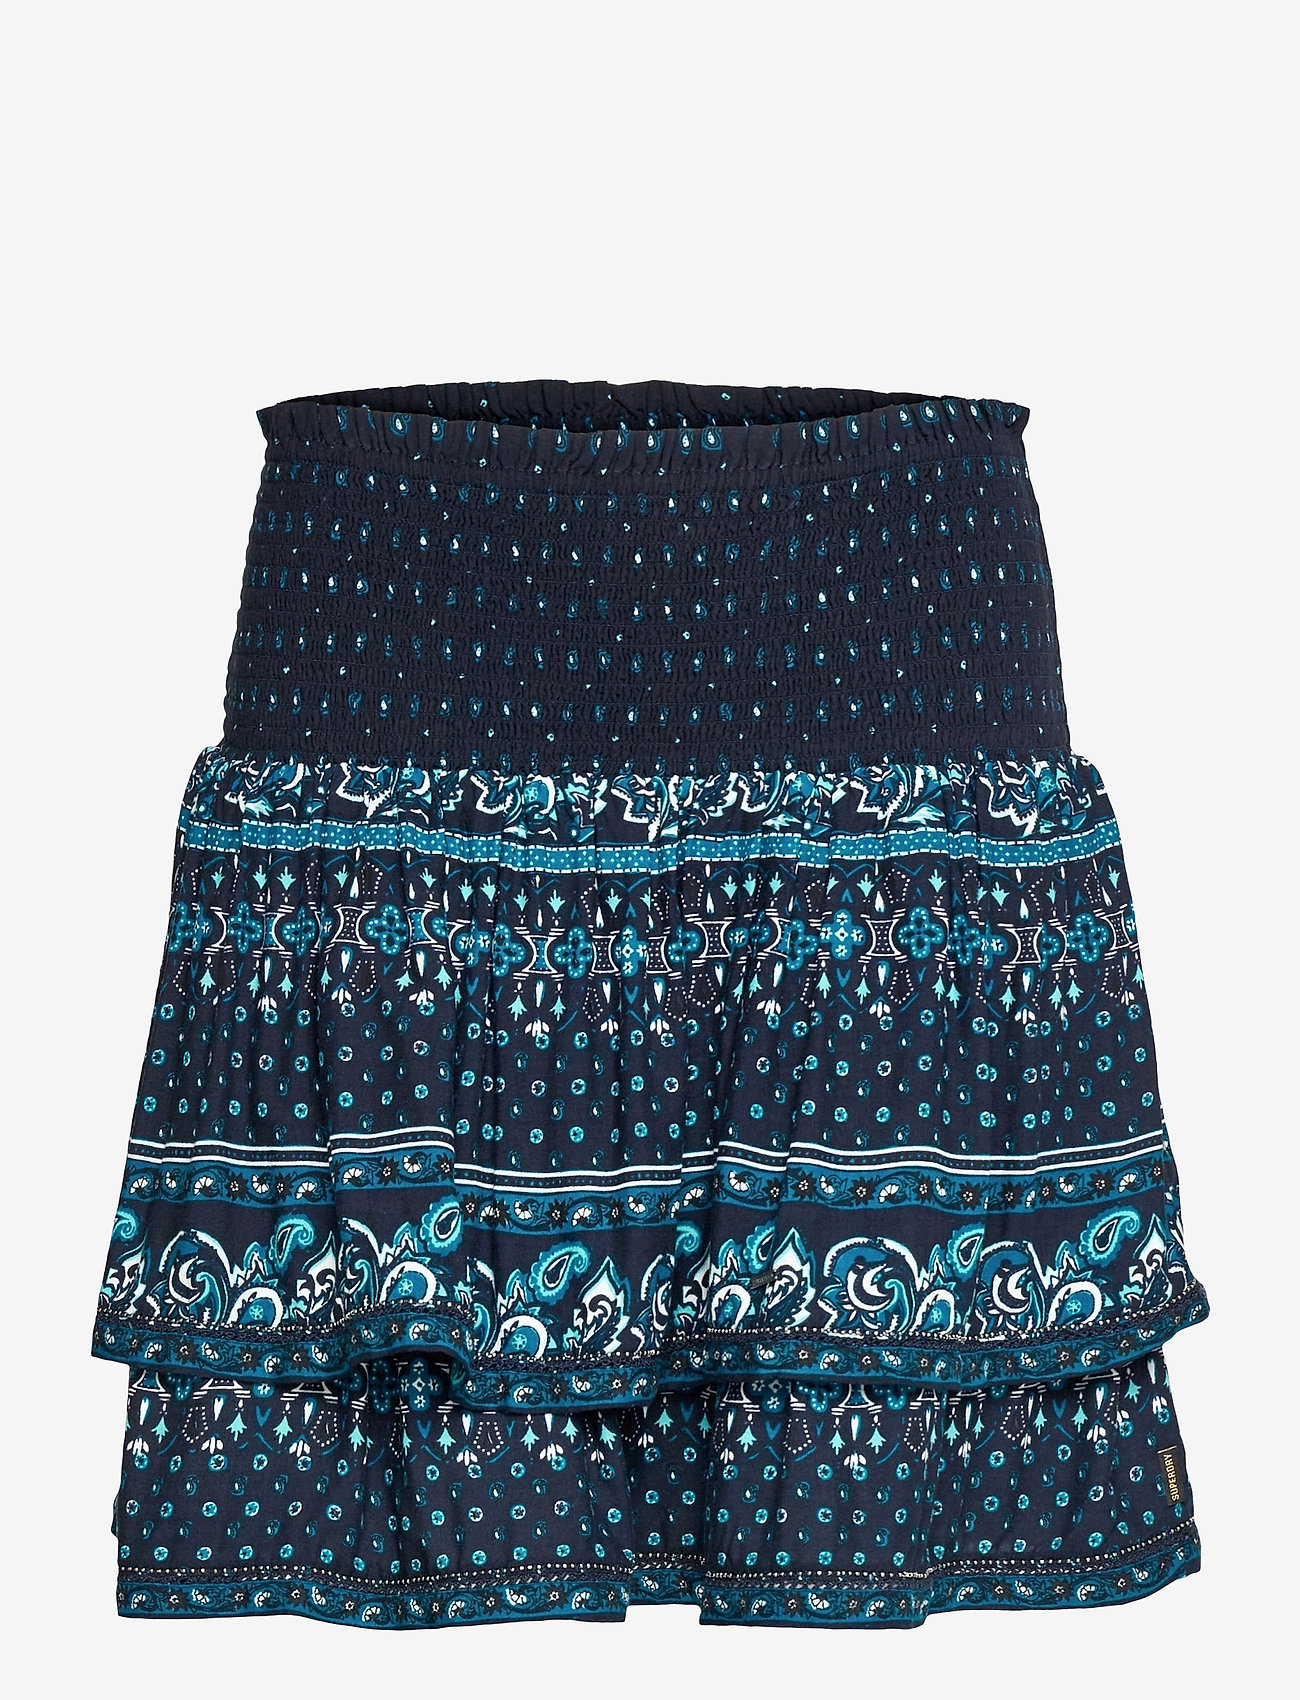 Superdry - AMEERA MINI SMOCKED SKIRT - short skirts - navy - 0